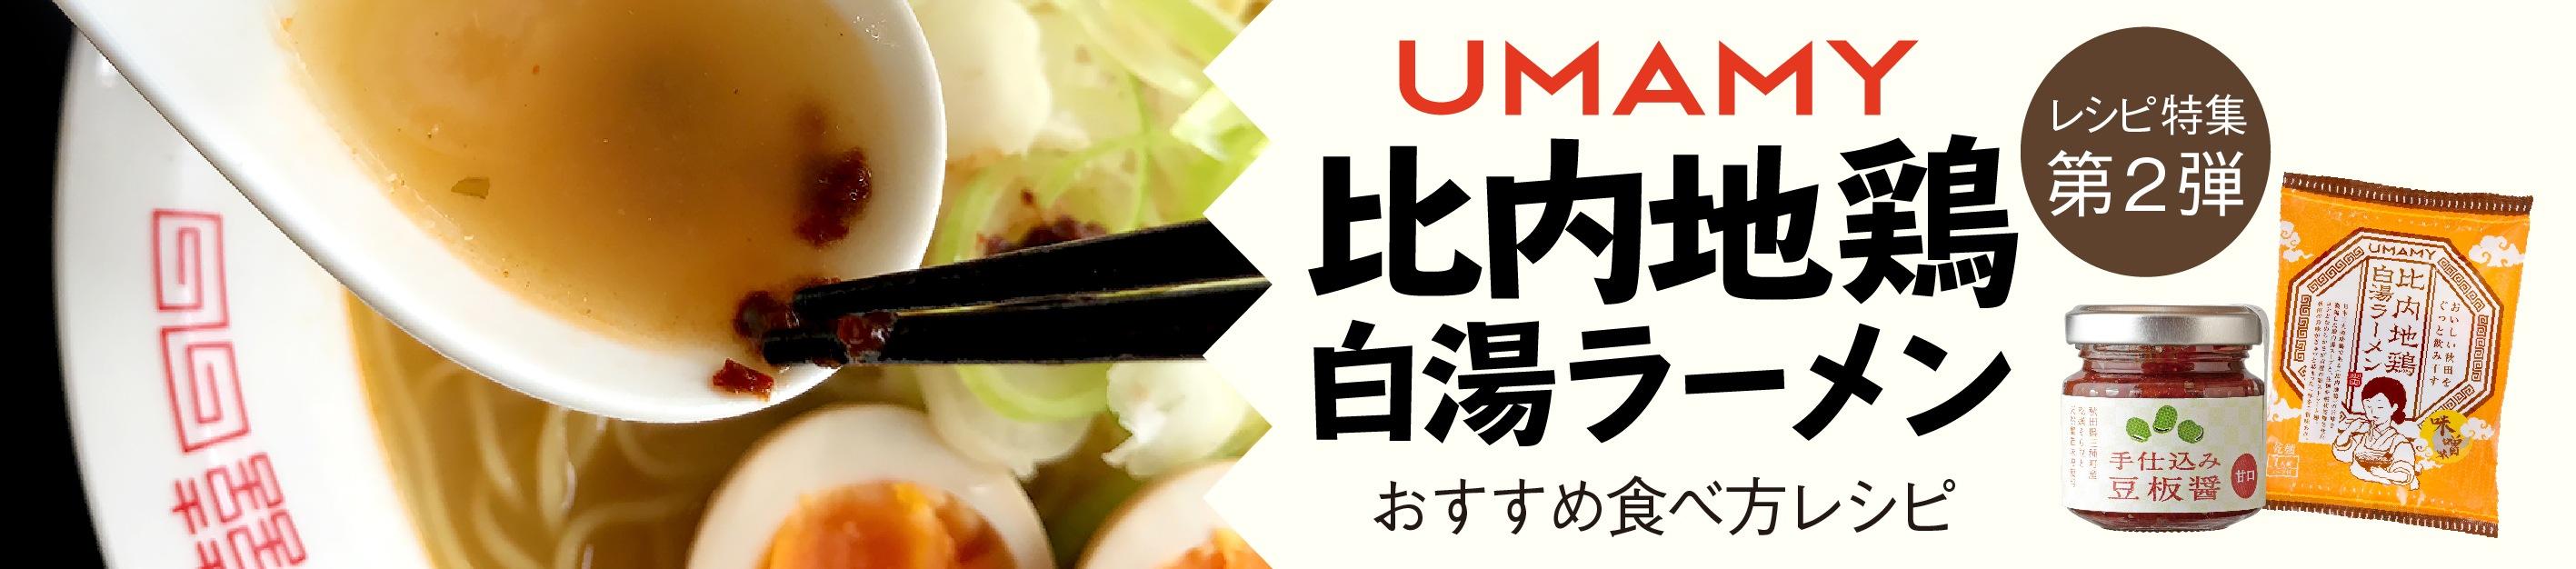 UMAMYラーメンおすすめ食べ方レシピ特集